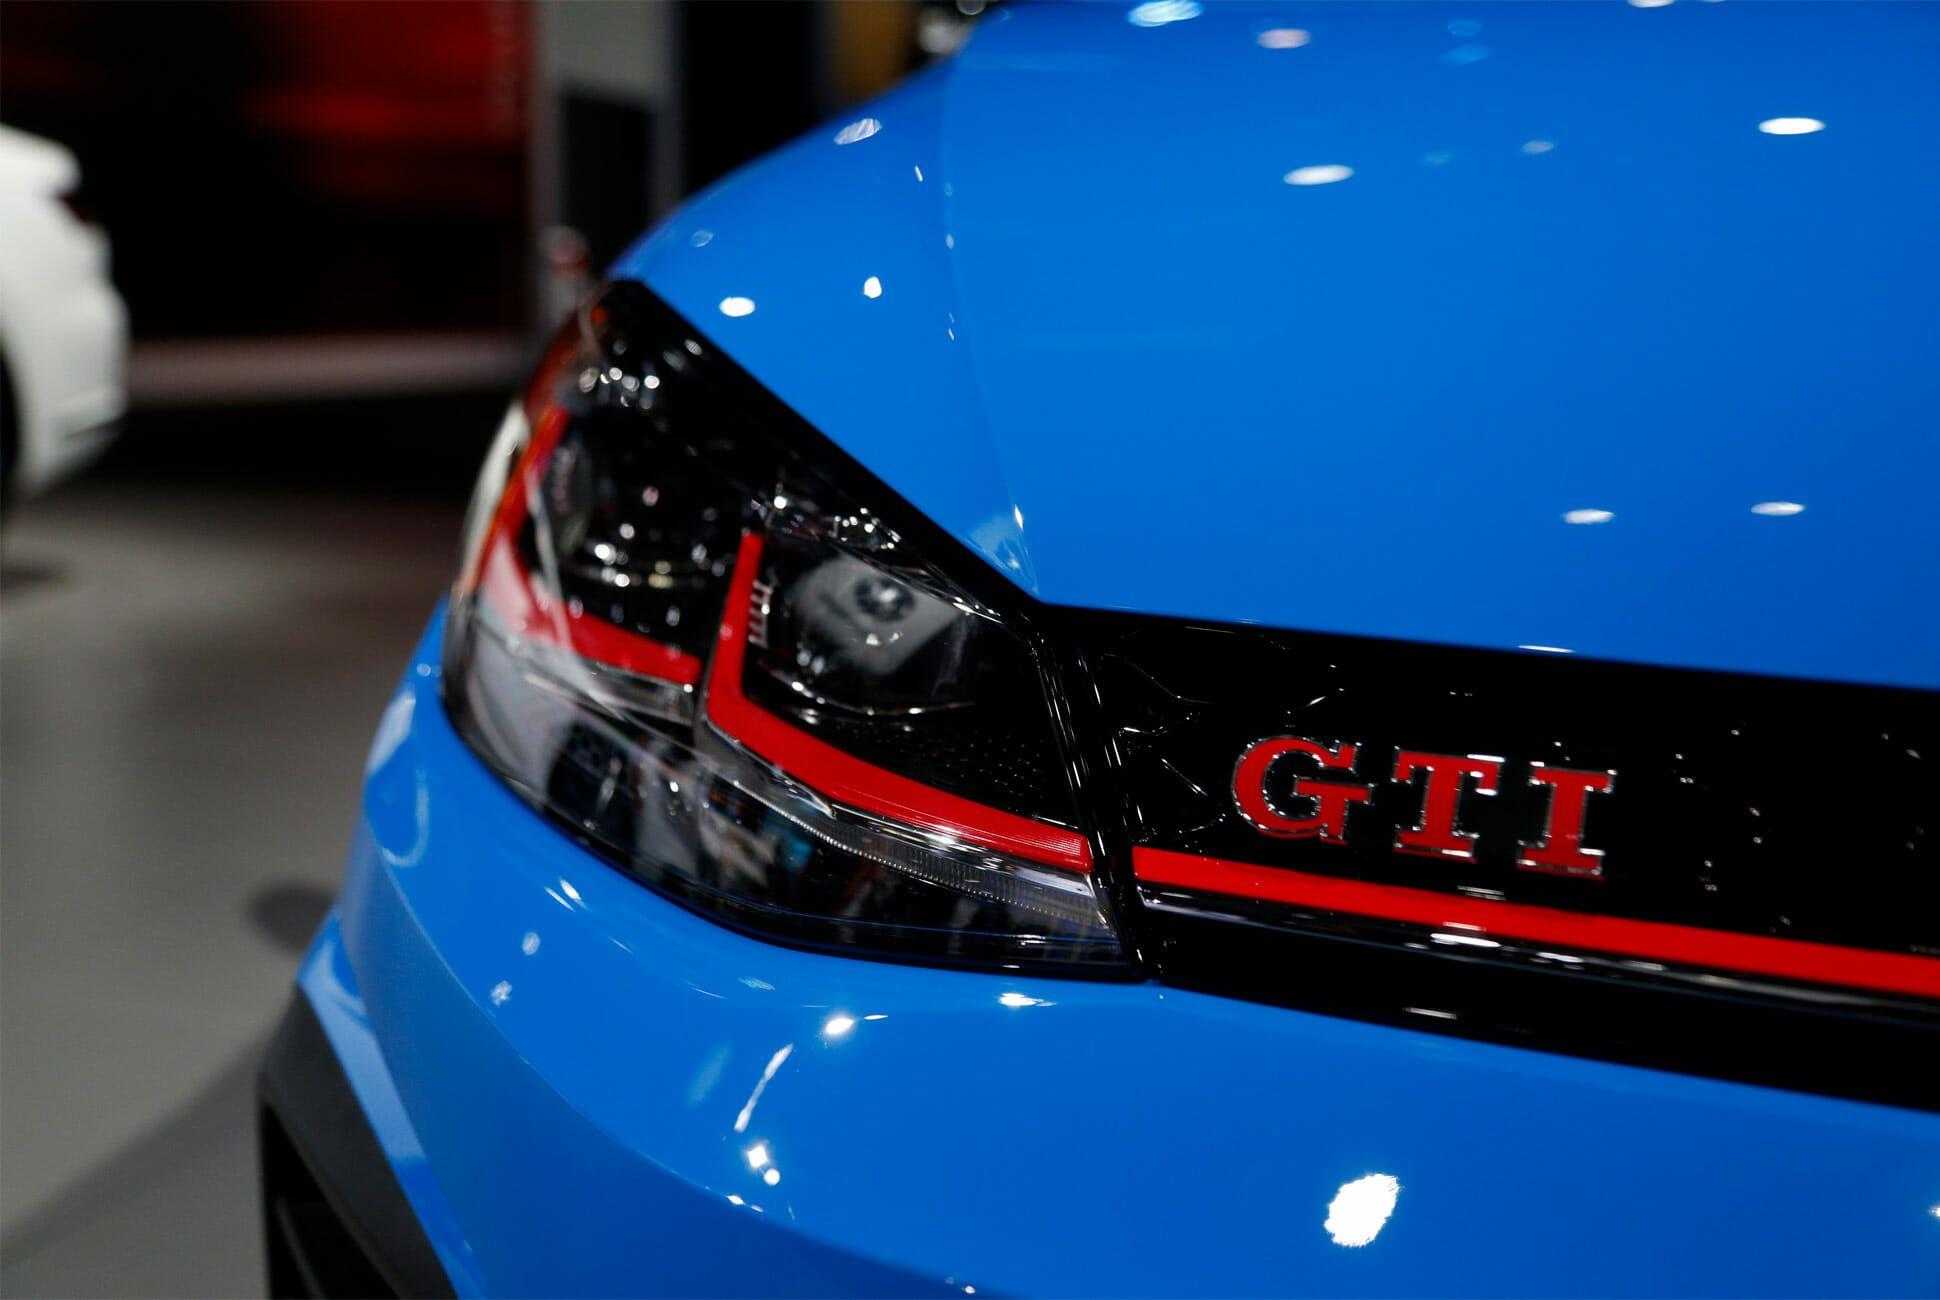 DAS-Best-Details-Gear-Patrol-GTI-Slide-1